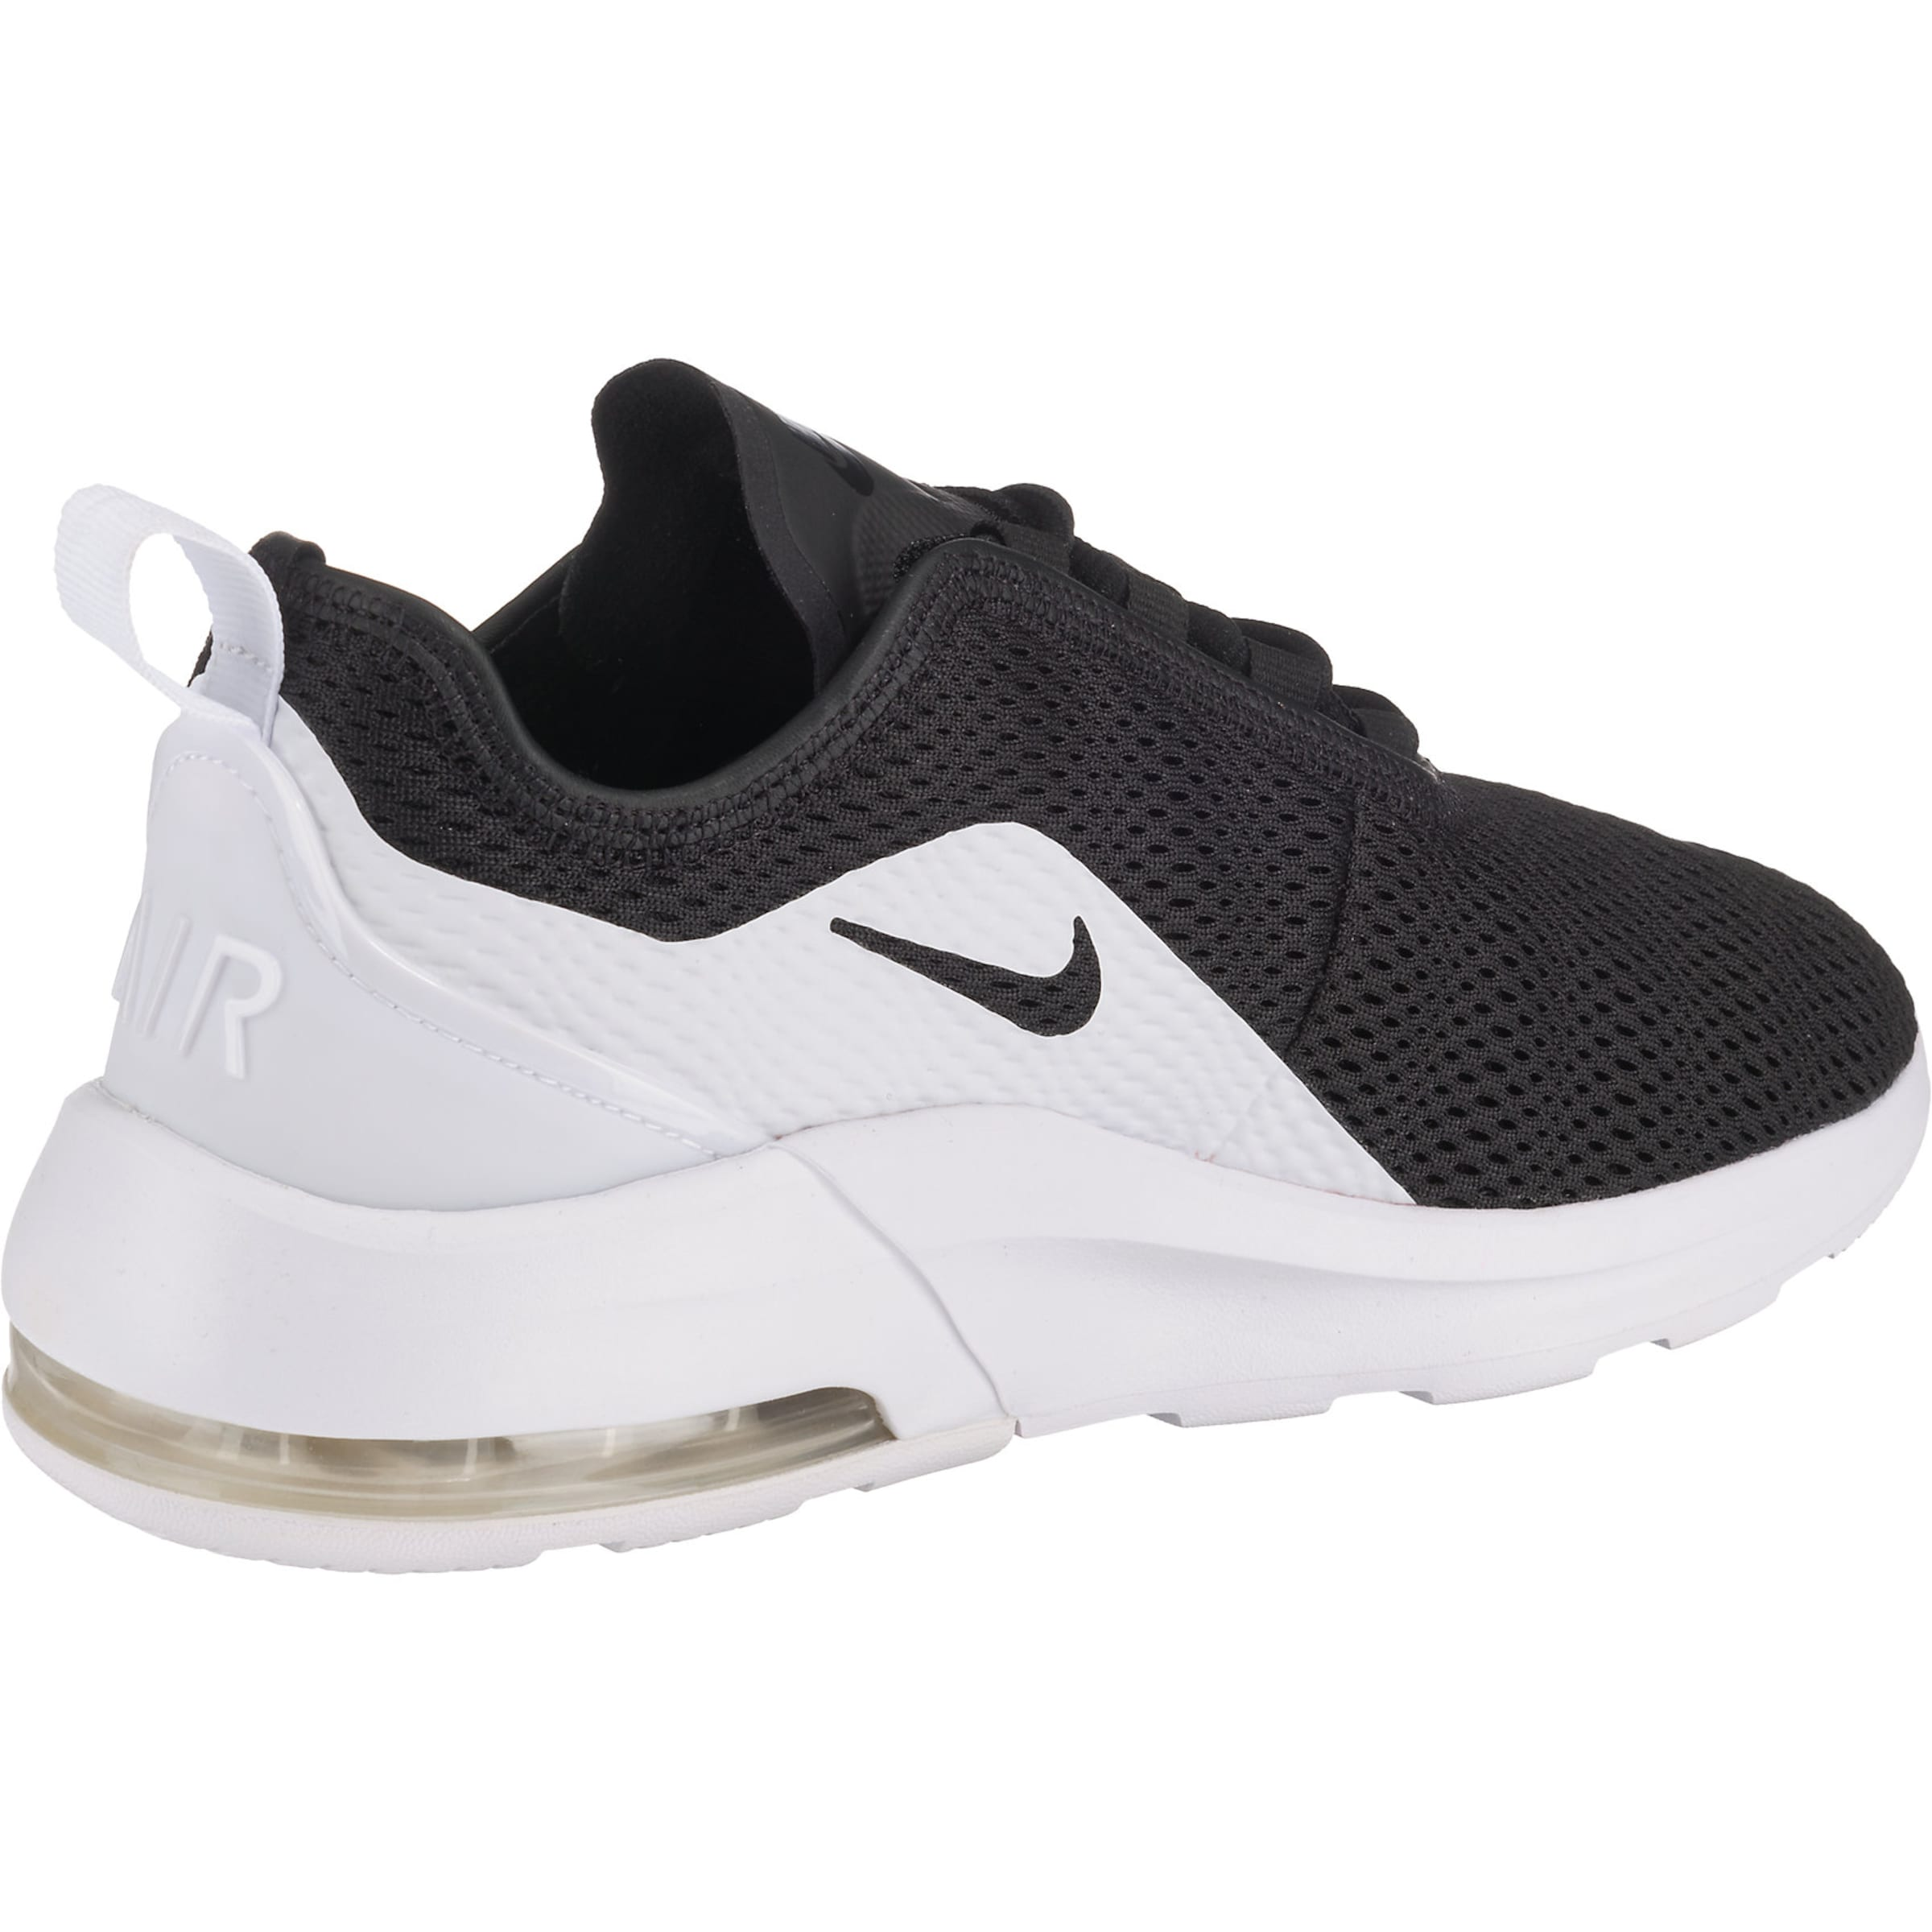 Sportswear Max Motion Sneakers In Nike SchwarzWeiß 'air 2' 5cRA34qjL